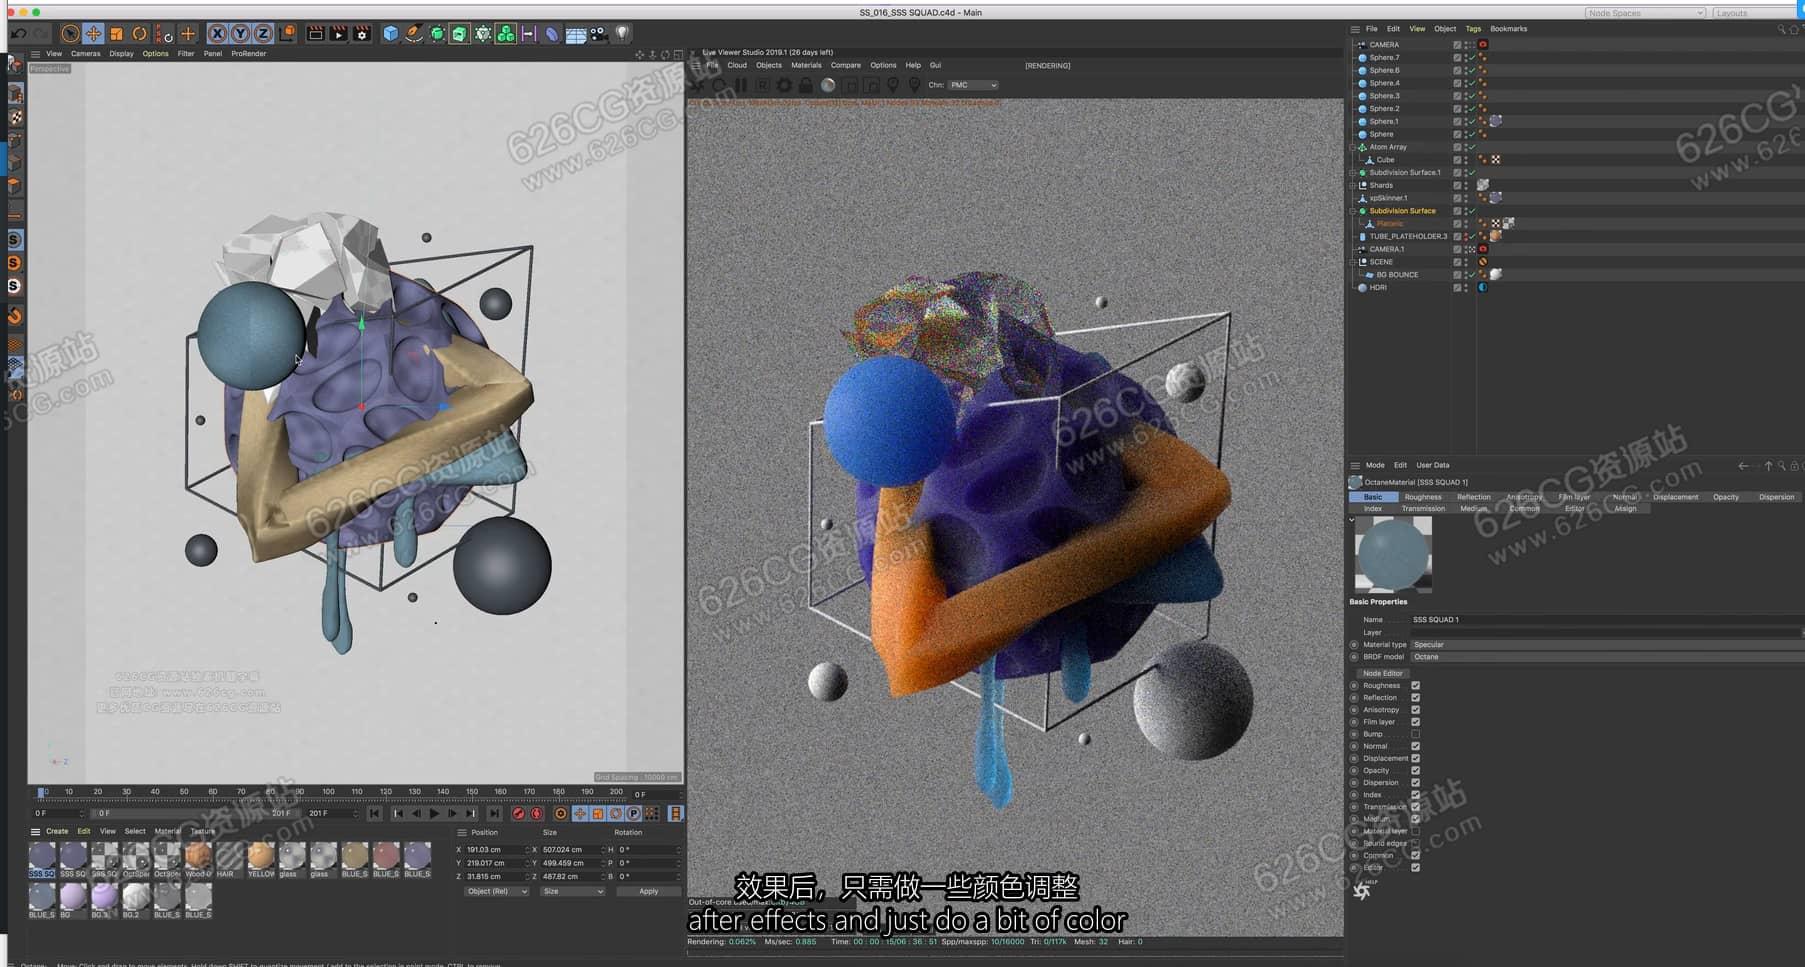 C4D教程:OC渲染器次表面散射3S材质渲染教程 中文字幕 626CG资源站